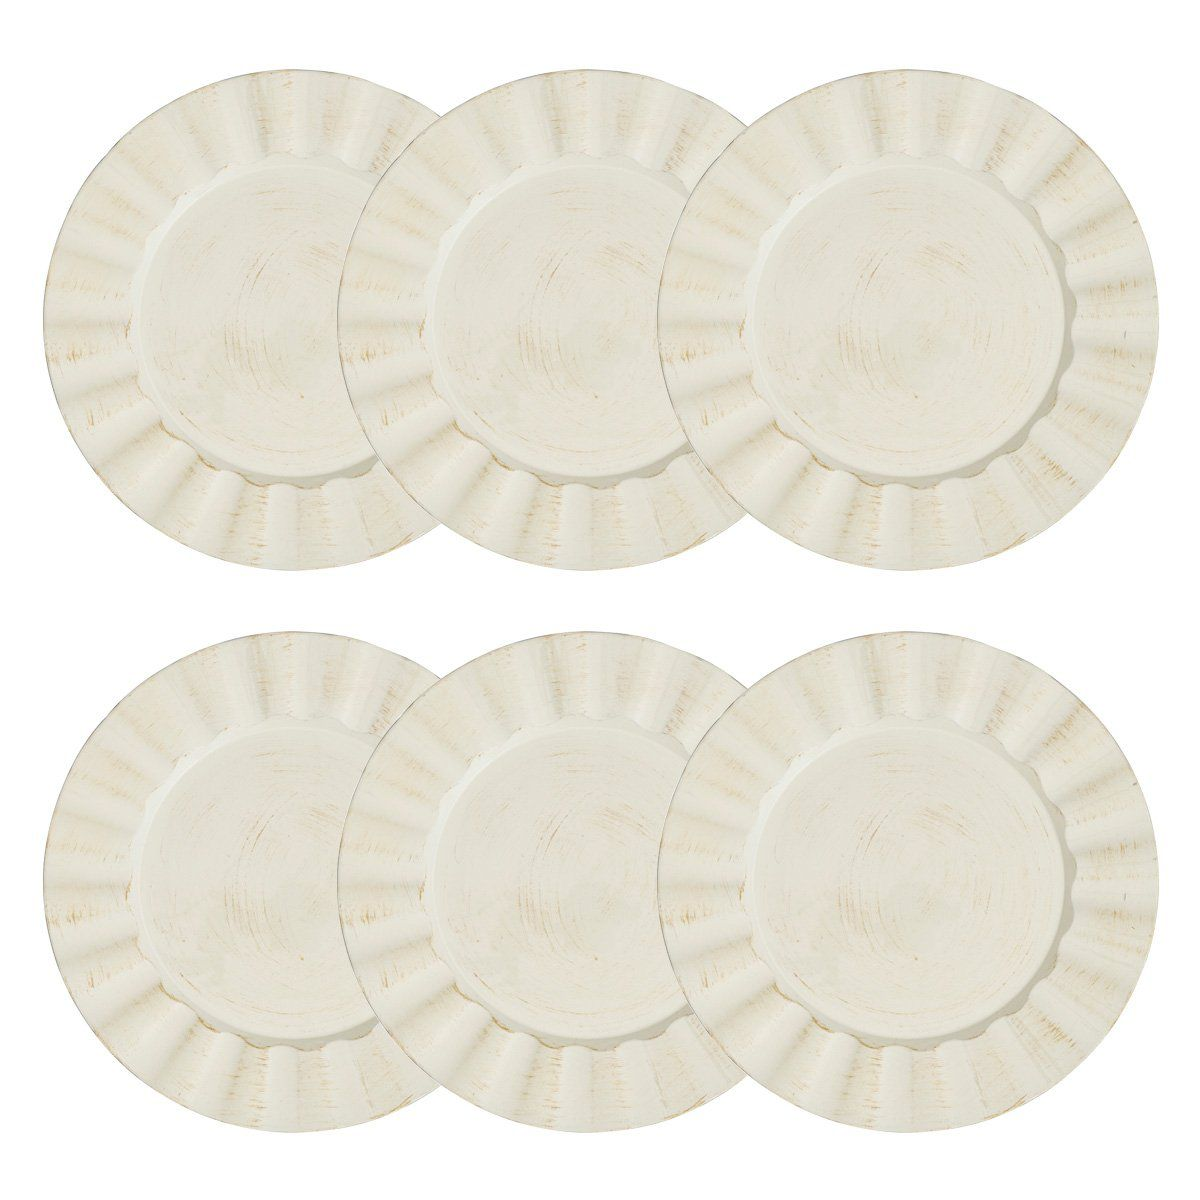 Jogo 6 peças Sousplat 33 cm de plástico bege e preto Cook Bon Gourmet - 30297